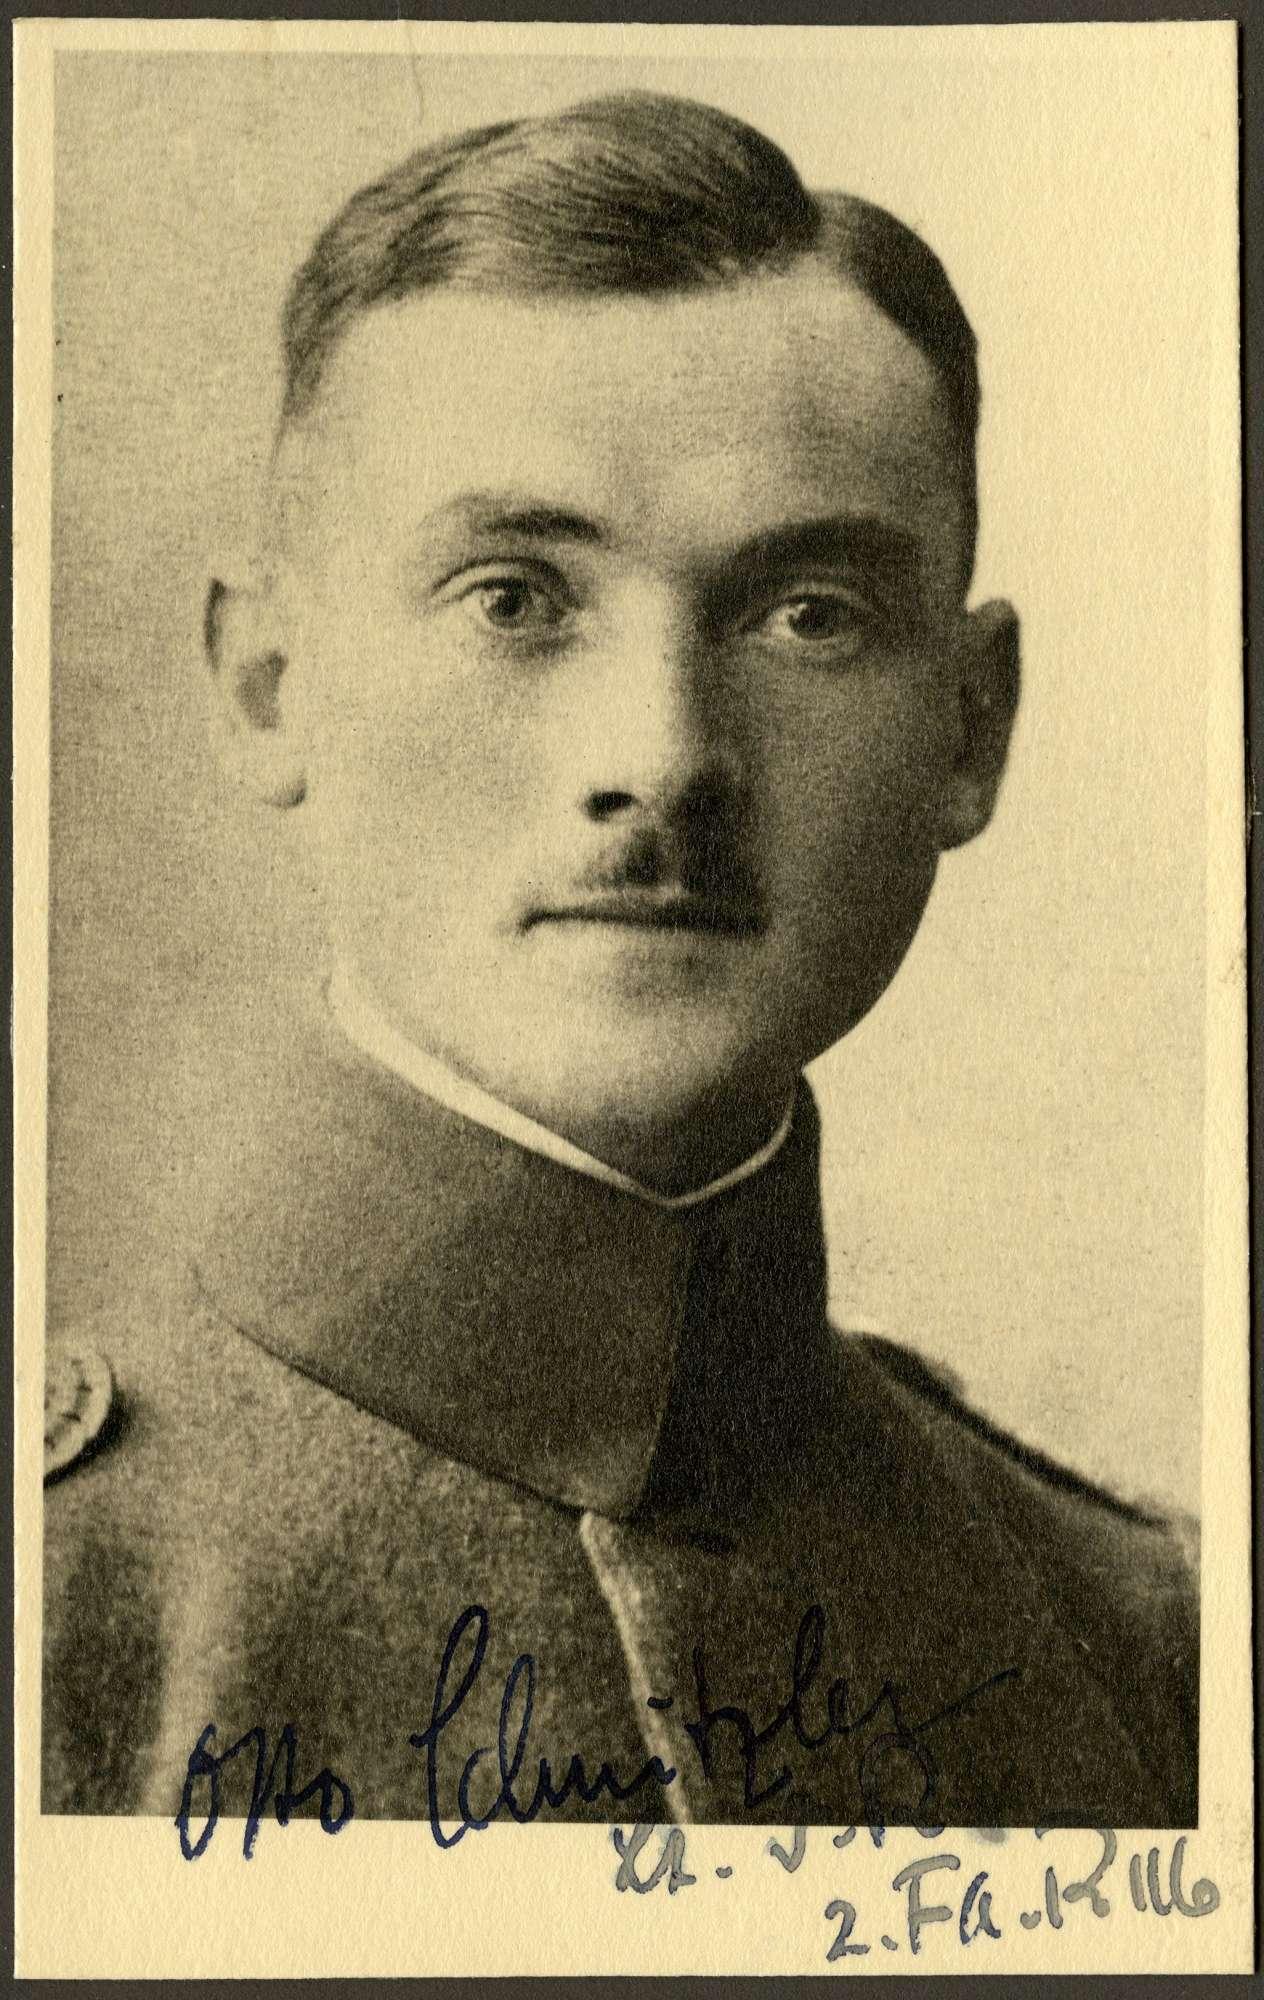 Schnitzler, Otto, Bild 1